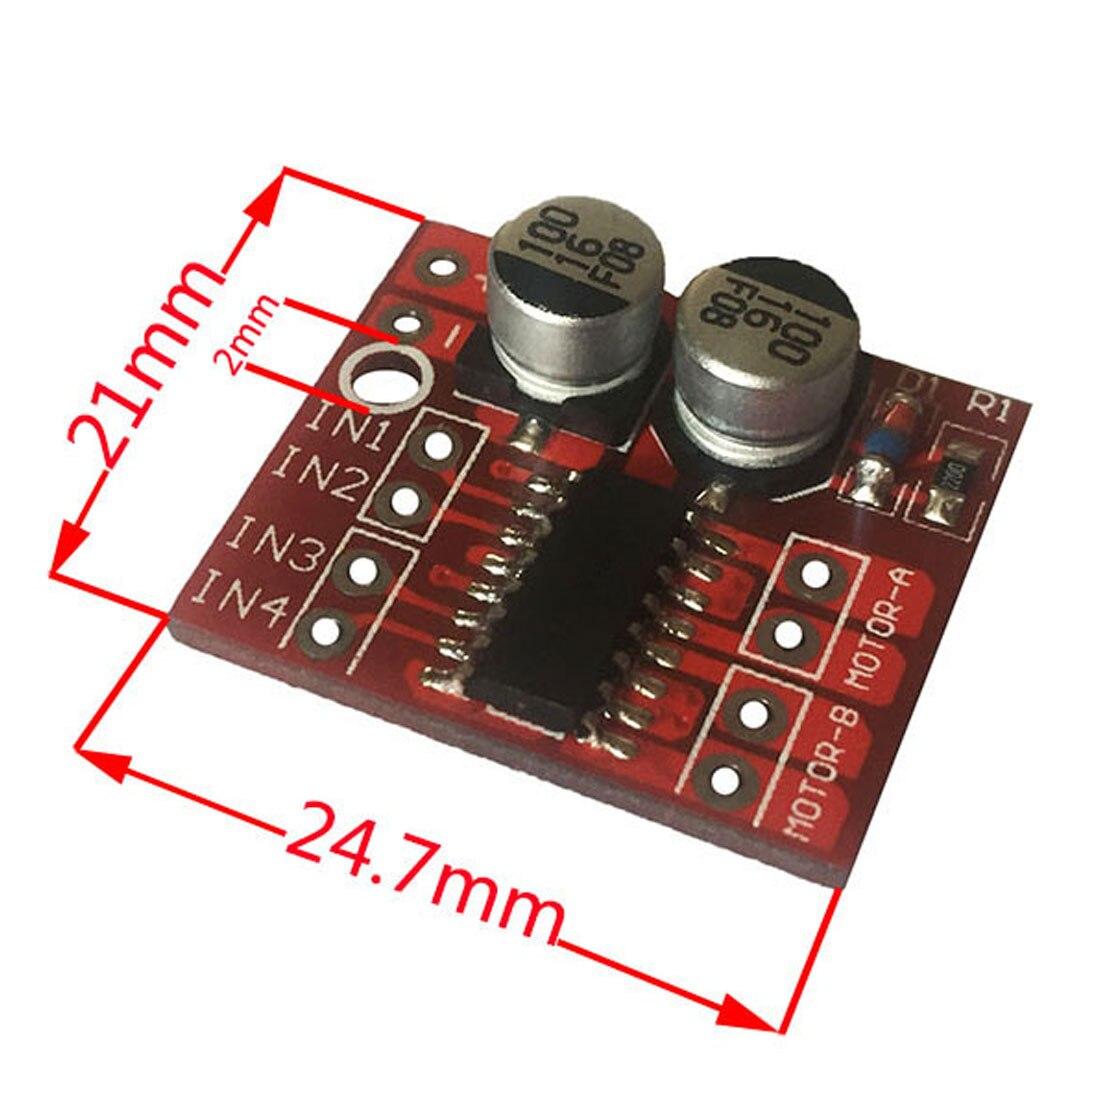 2-channel DC motor driving module Positive Inversion PWM Speed Mini Motor Dual H-bridge Stepper Motor Driver